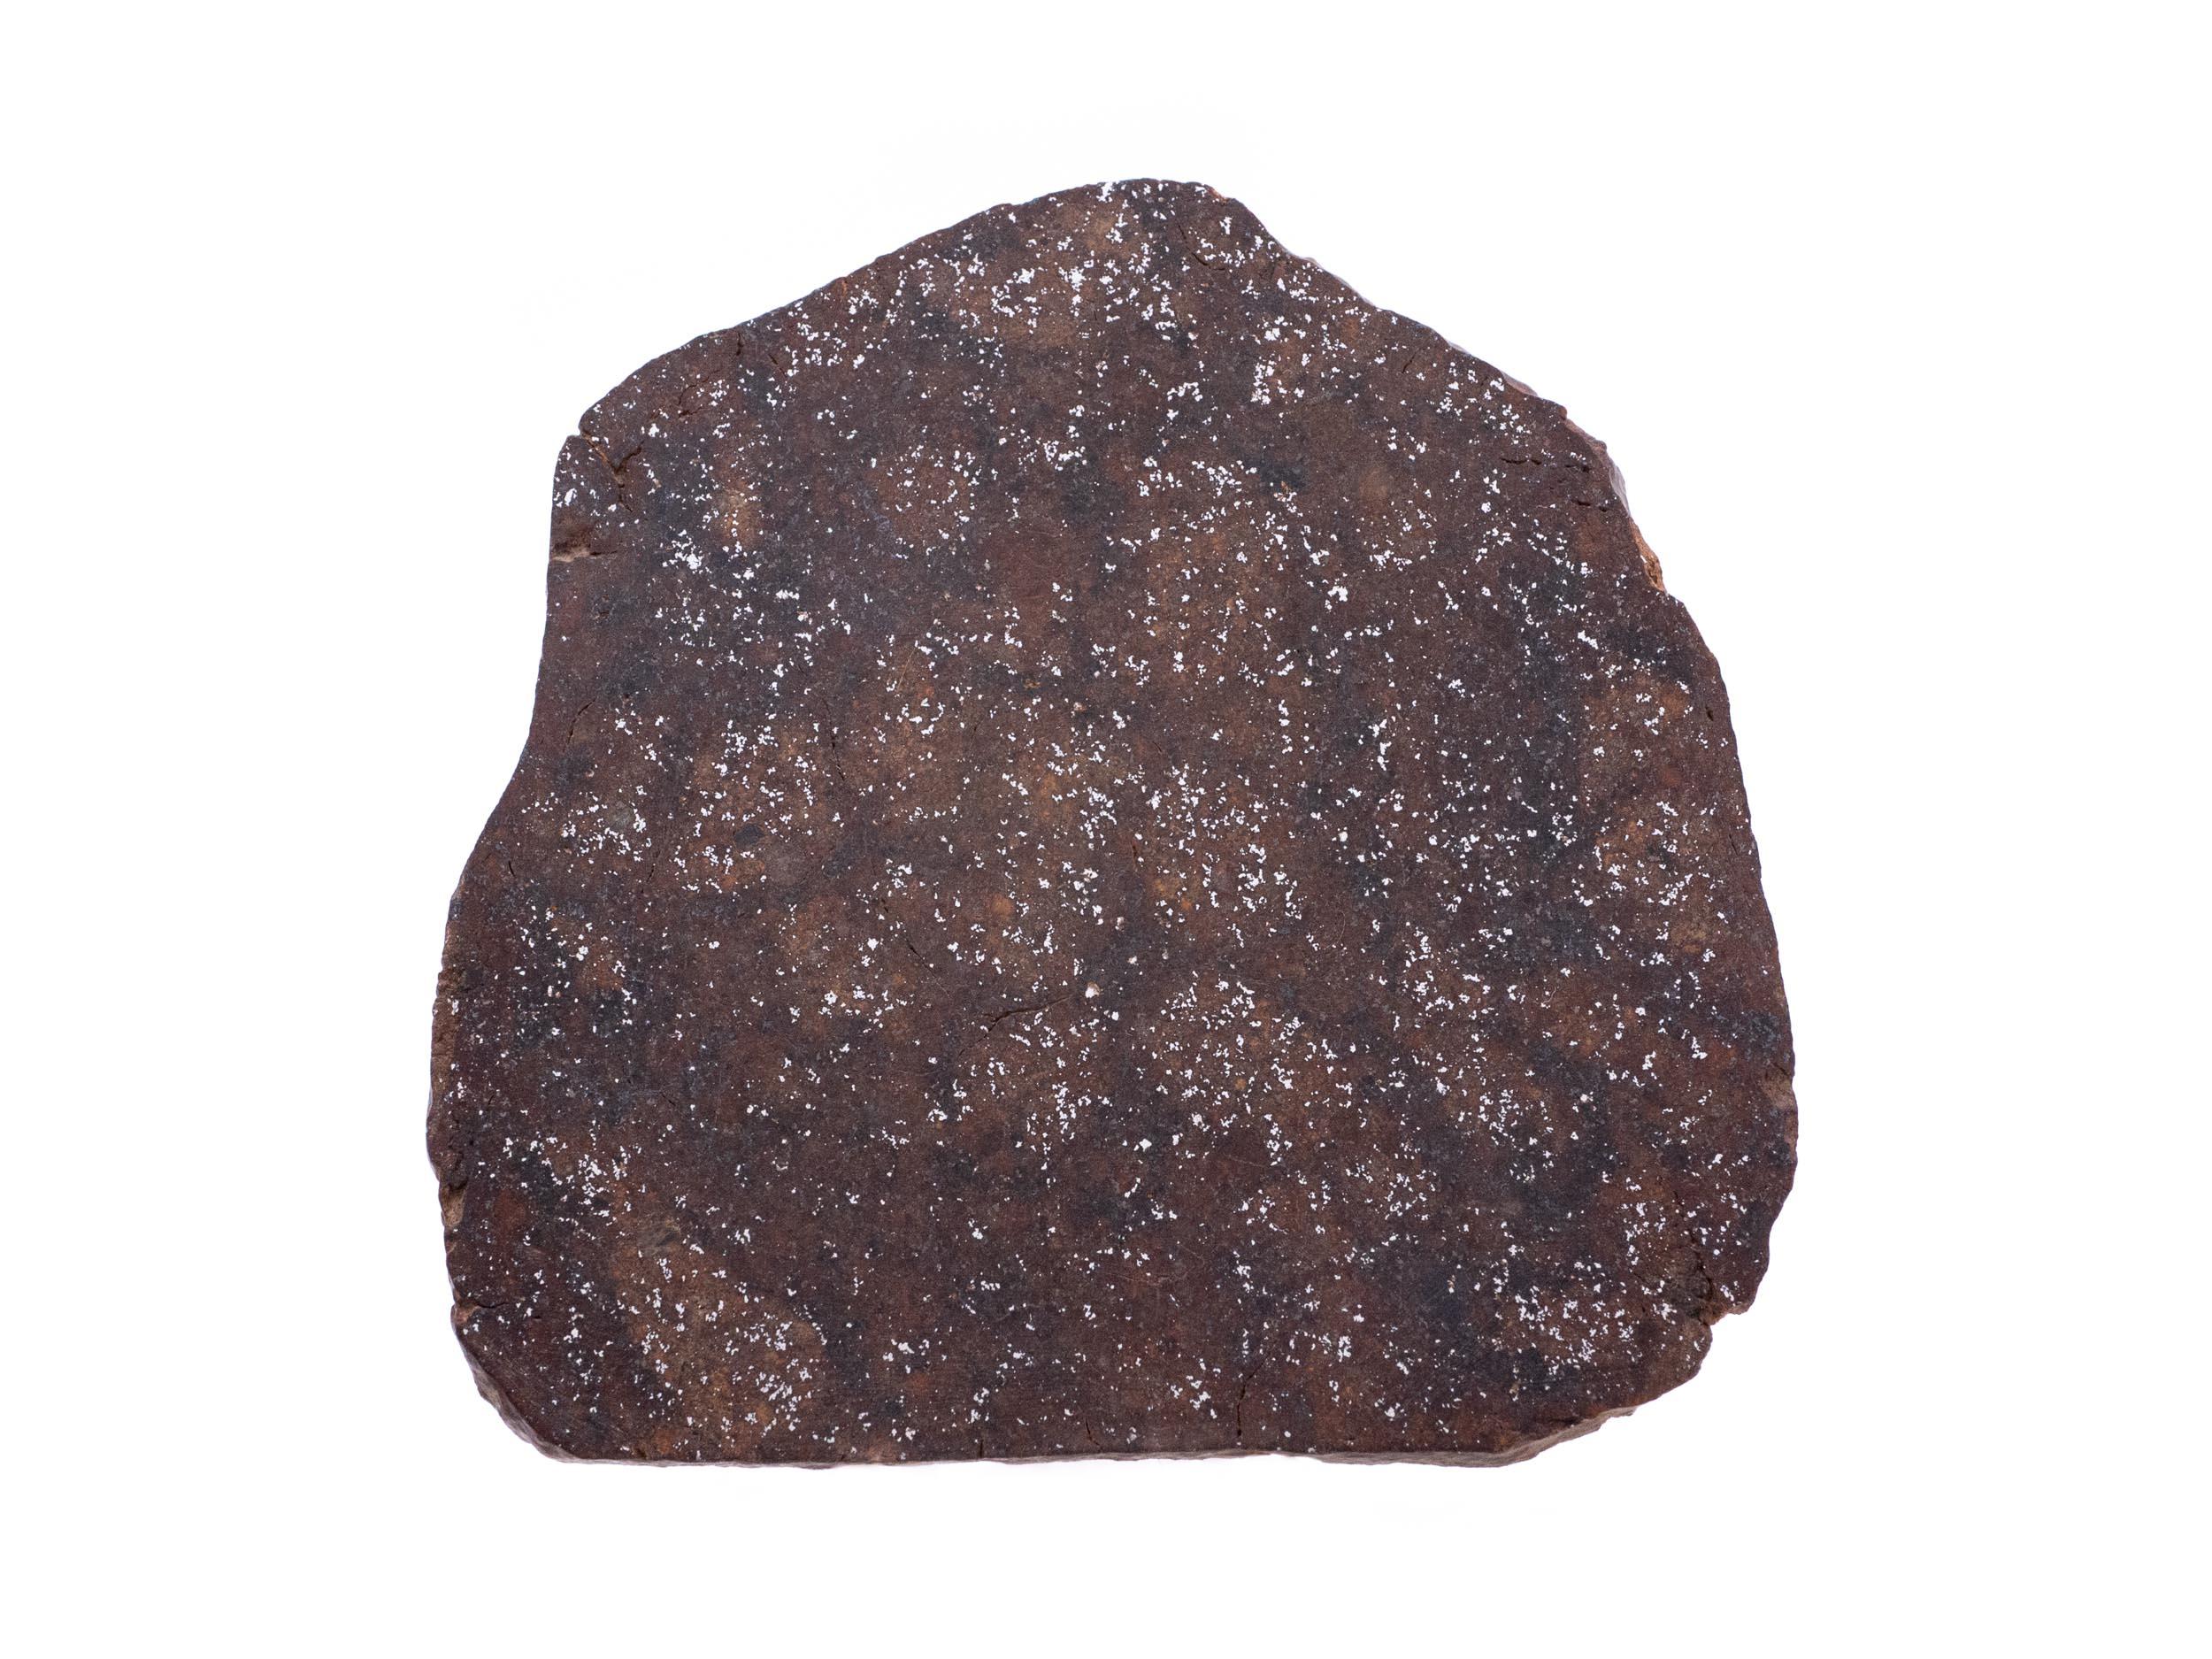 stone meteorite 37 6